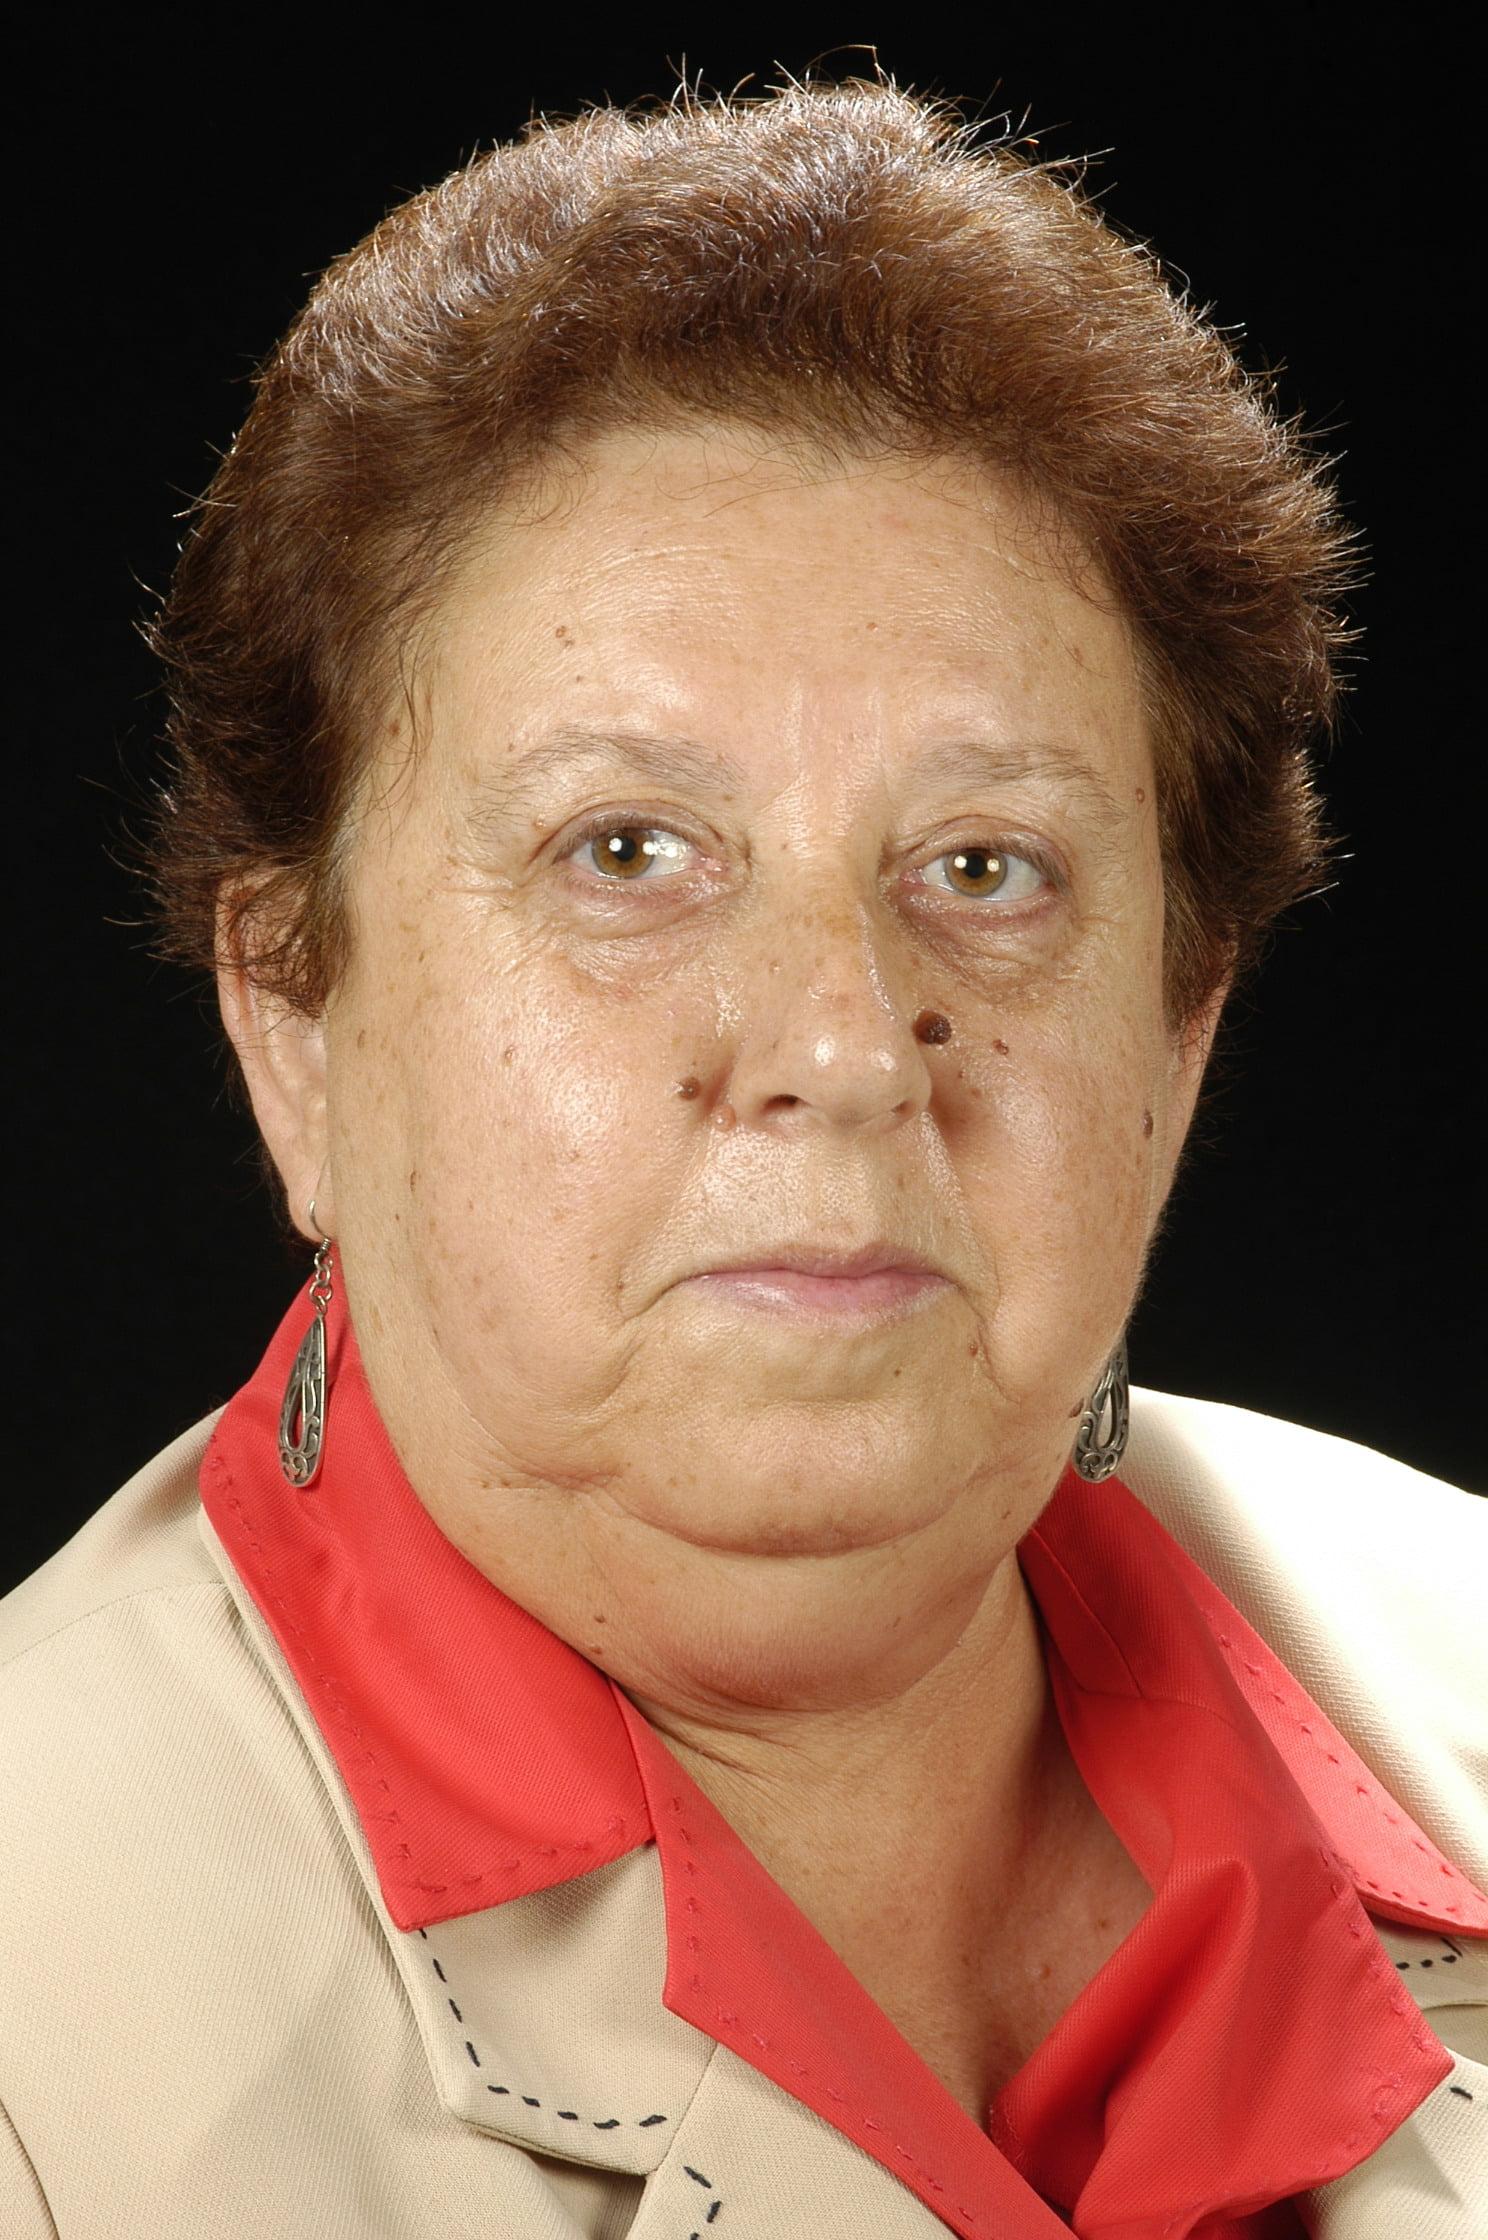 Dra. Virtudes Moreno Martínez